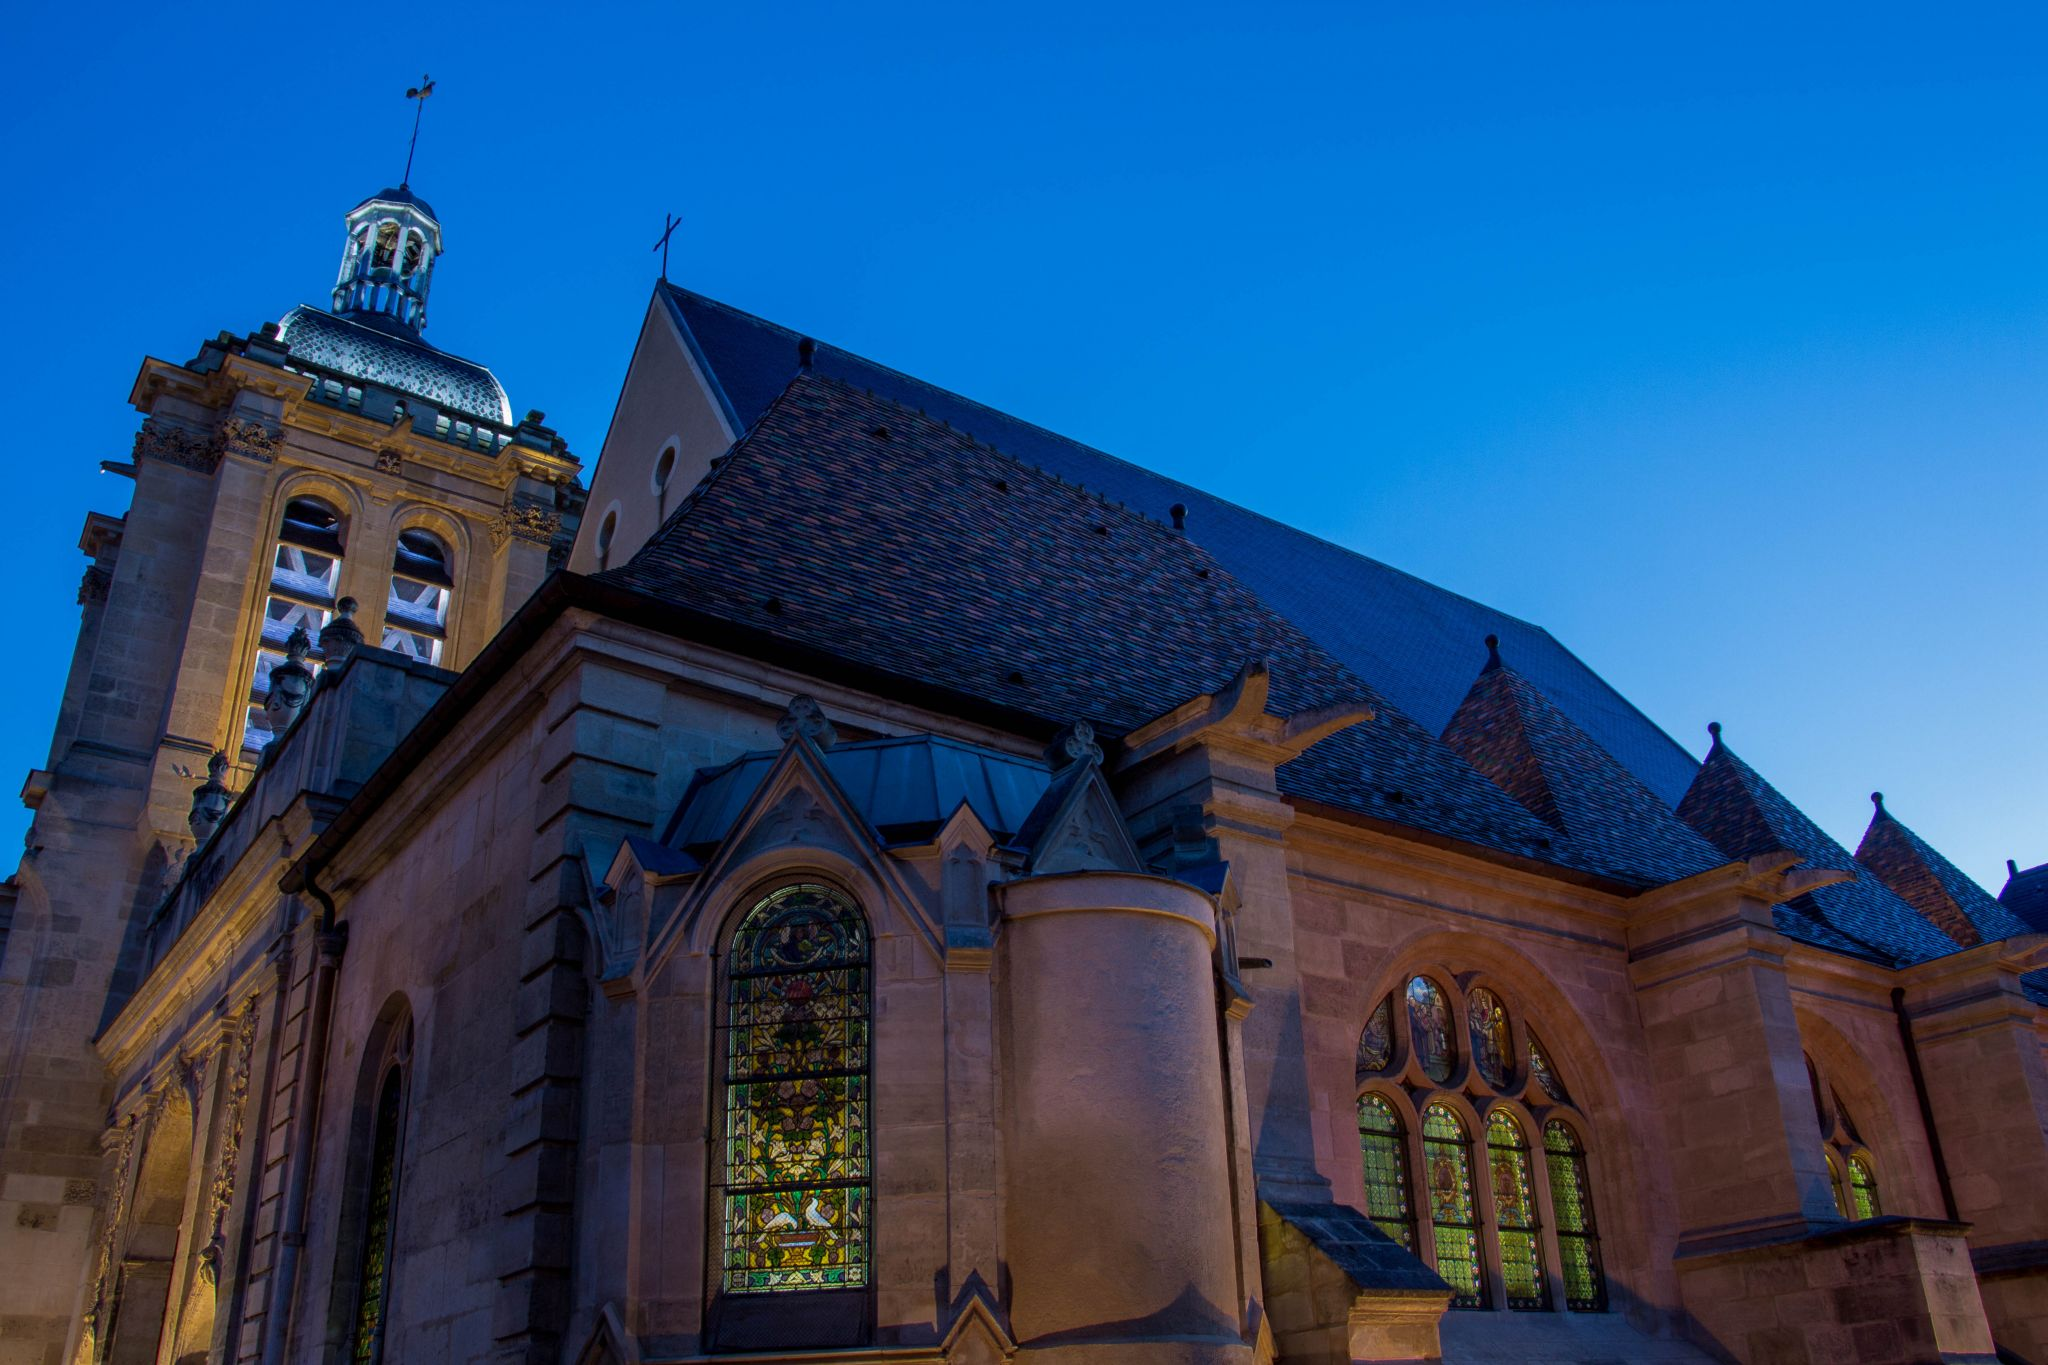 Eglise notre dame, France